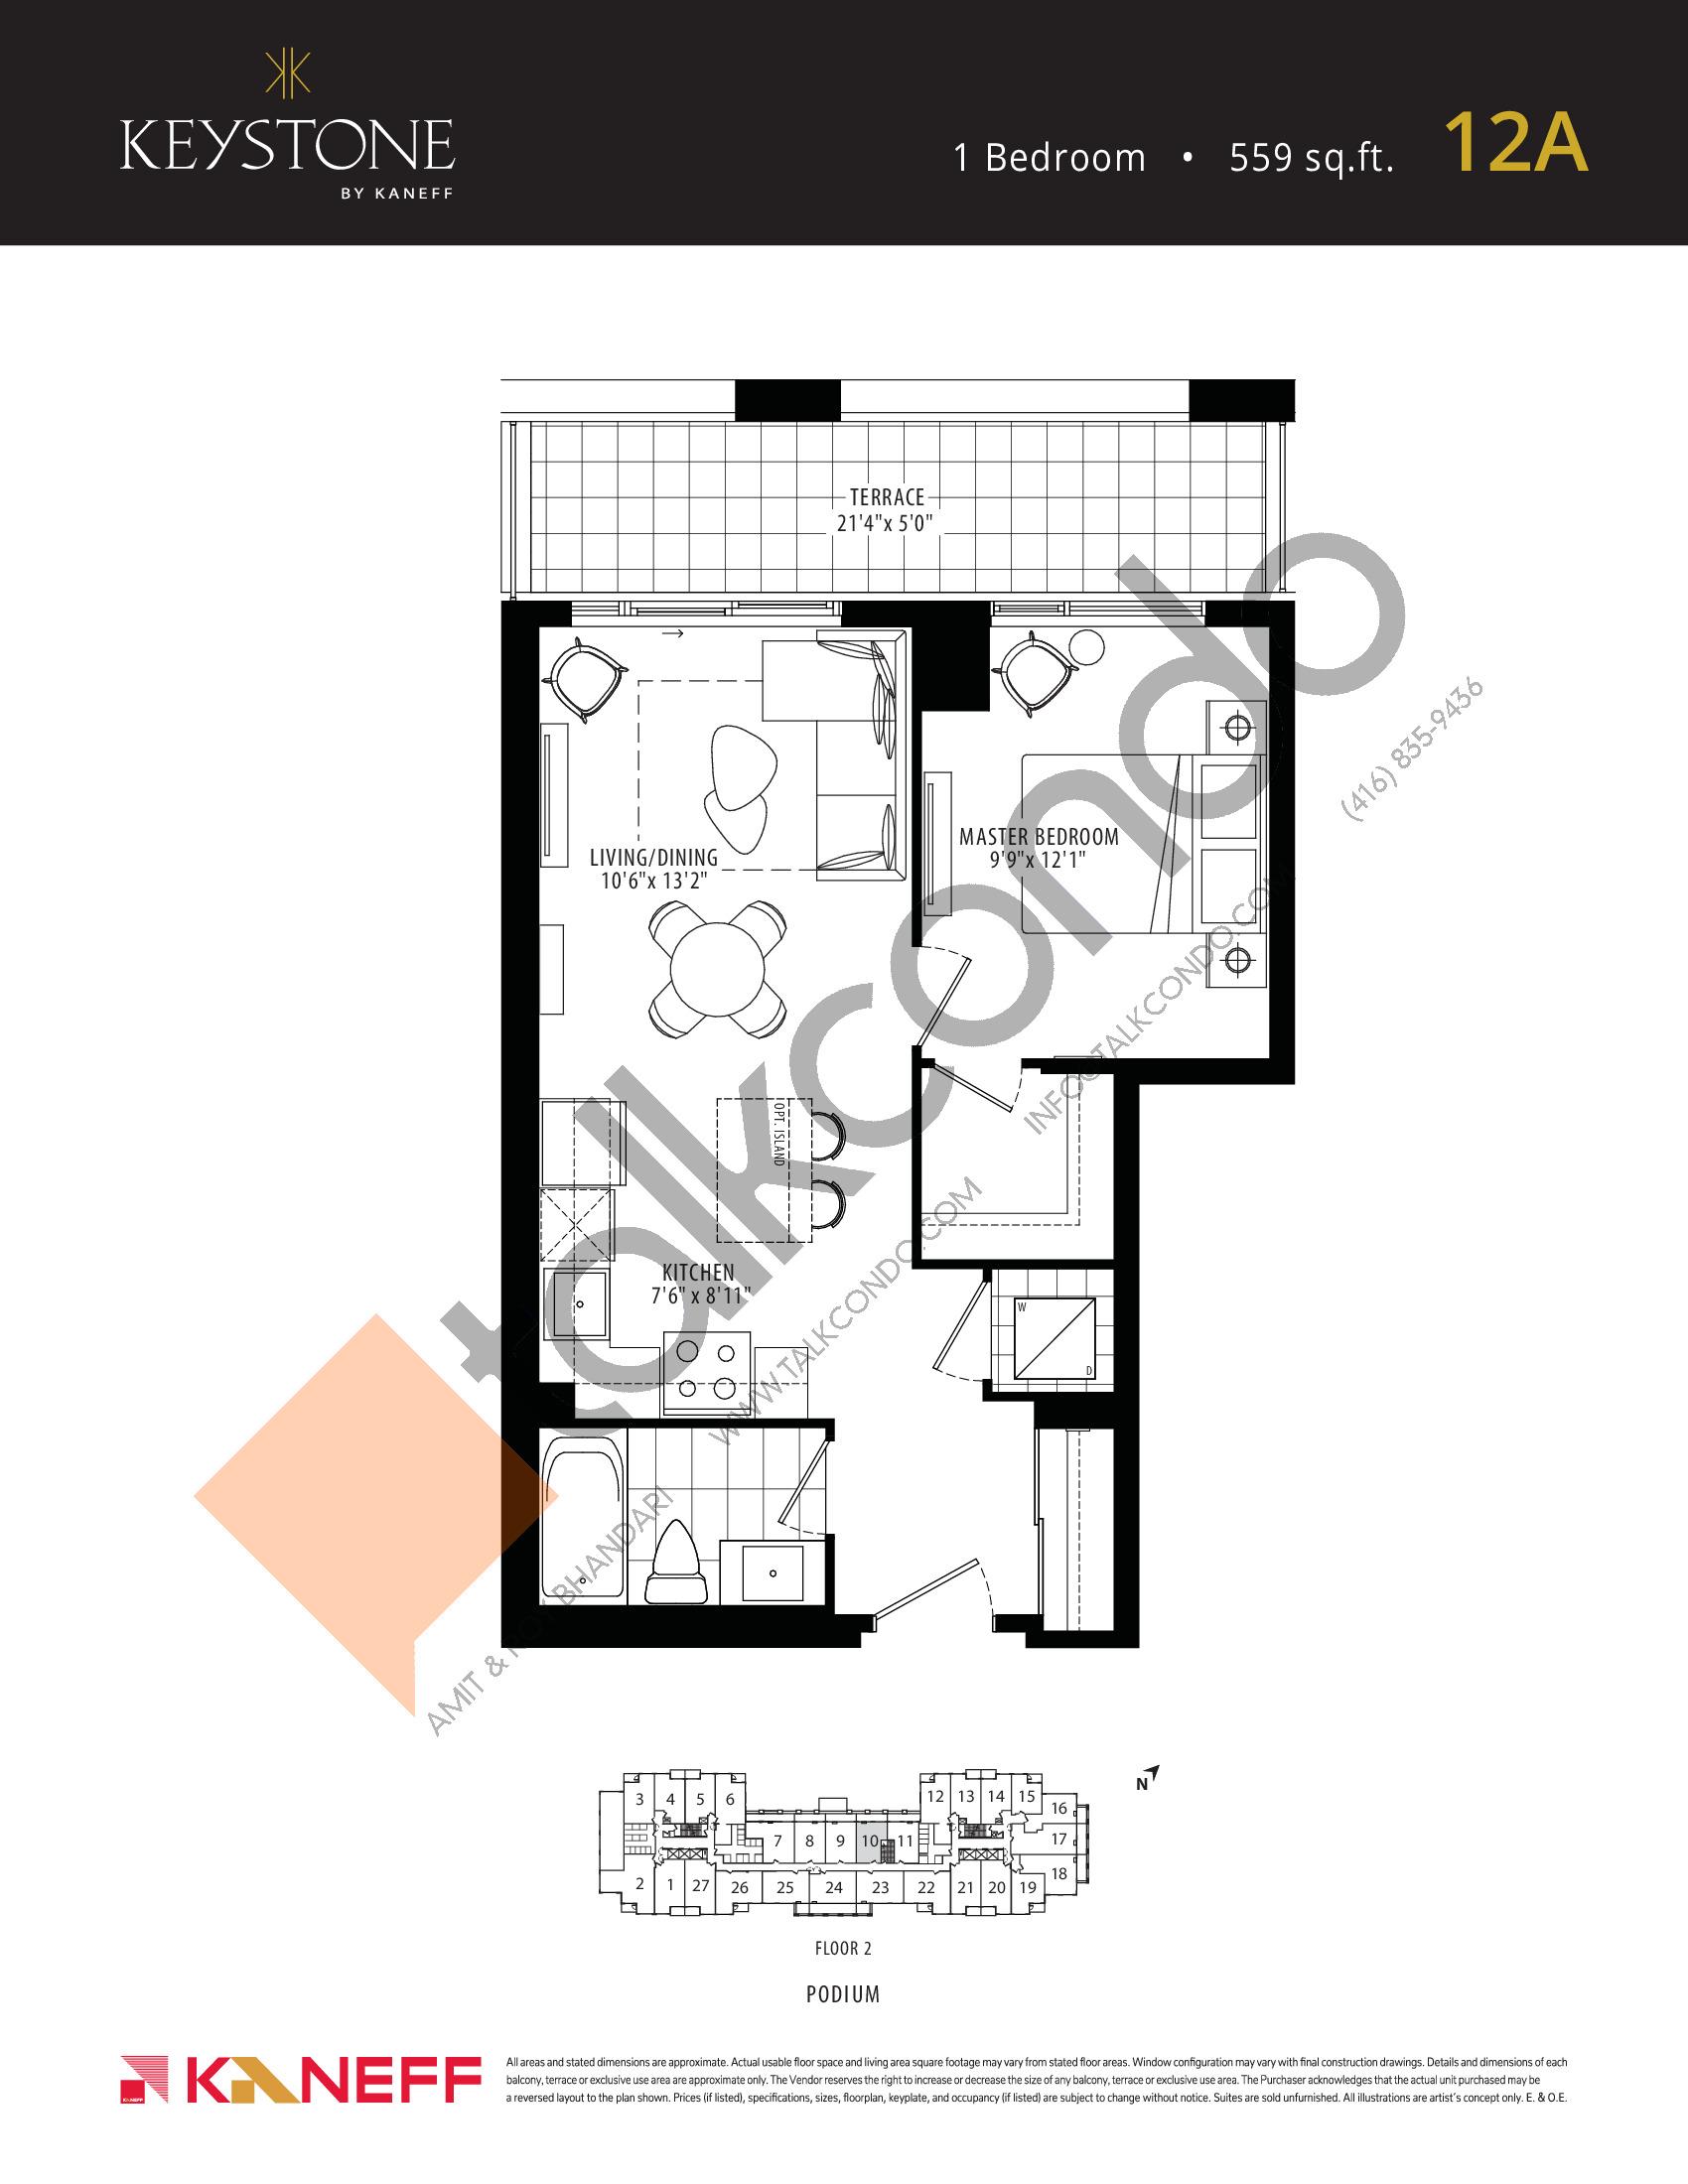 12A Floor Plan at Keystone Condos Phase 2 - 559 sq.ft